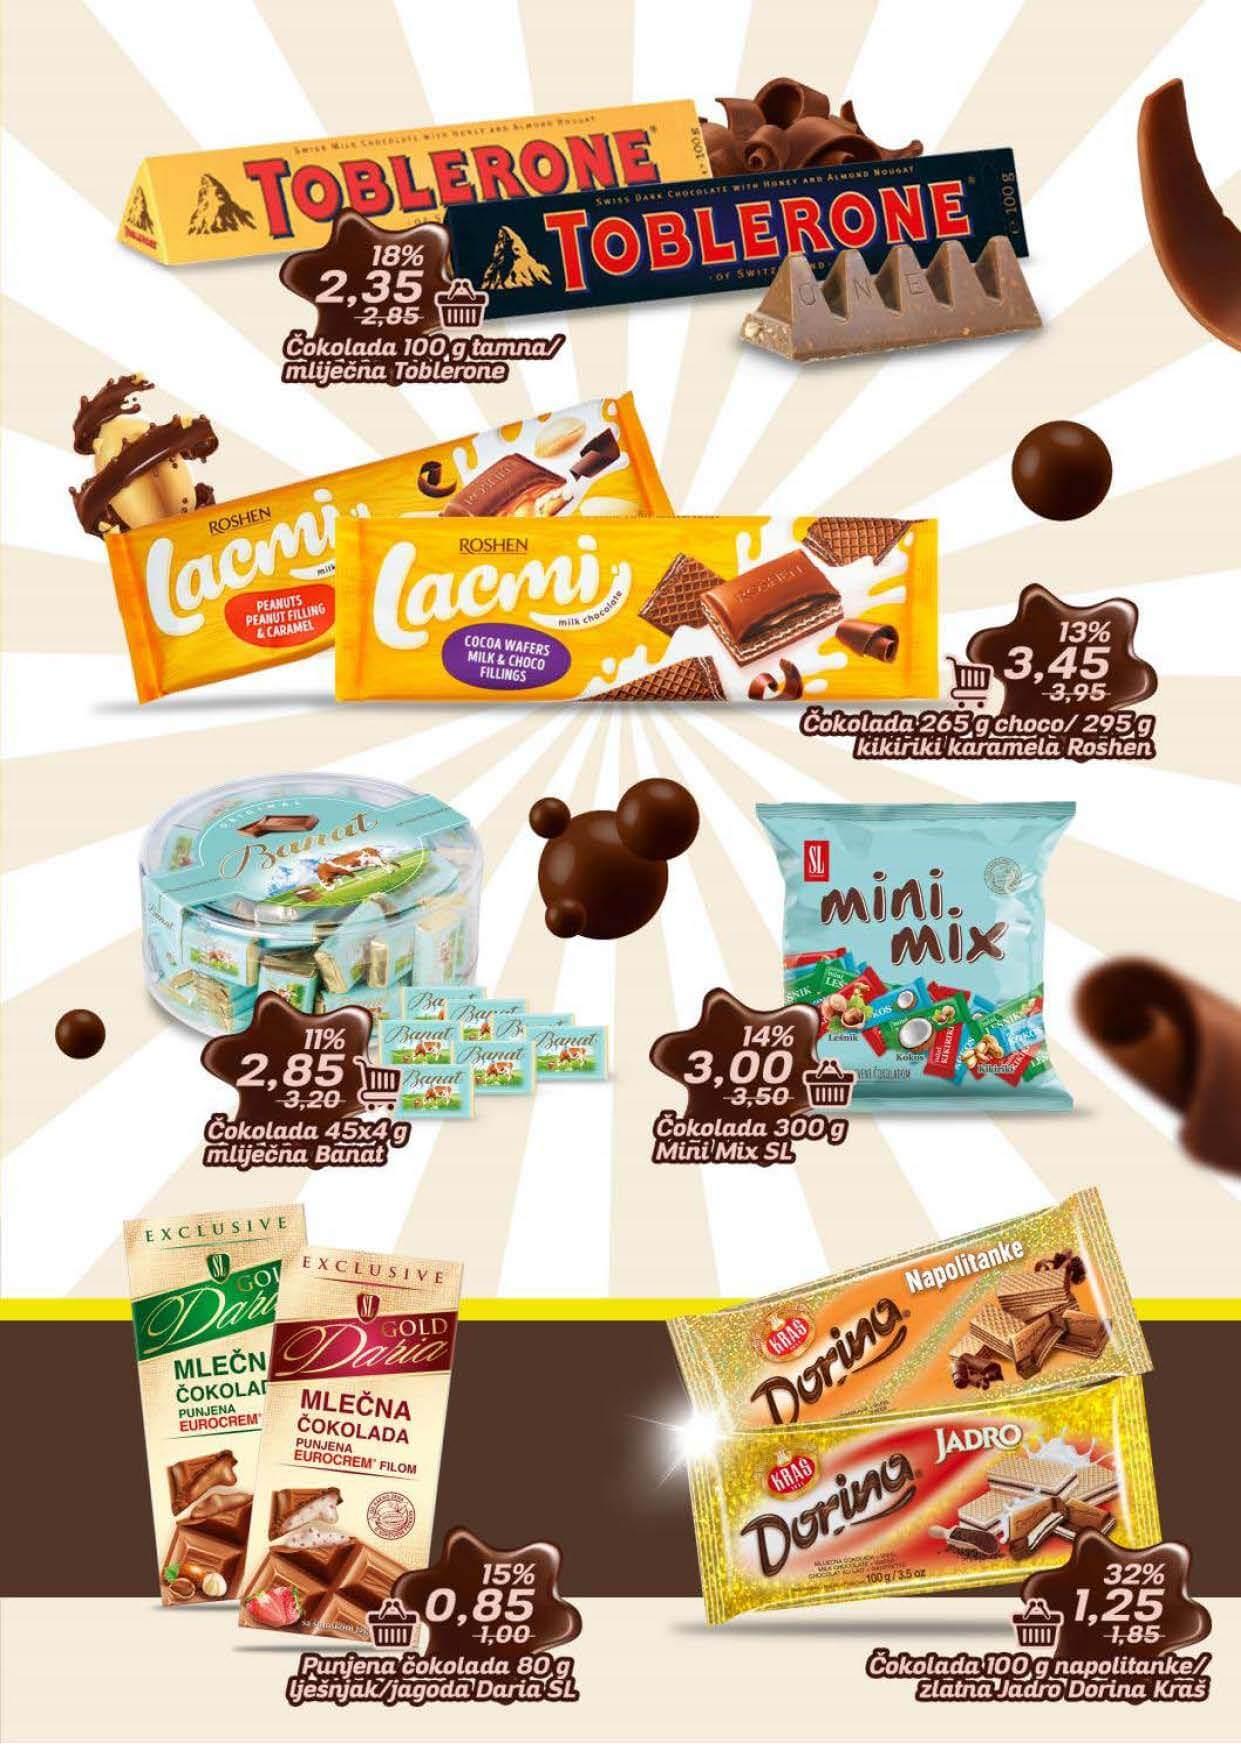 BINGO Katalog Dani cokolade JUL 2021 1.7.2021. 7.7.2021. Page 3